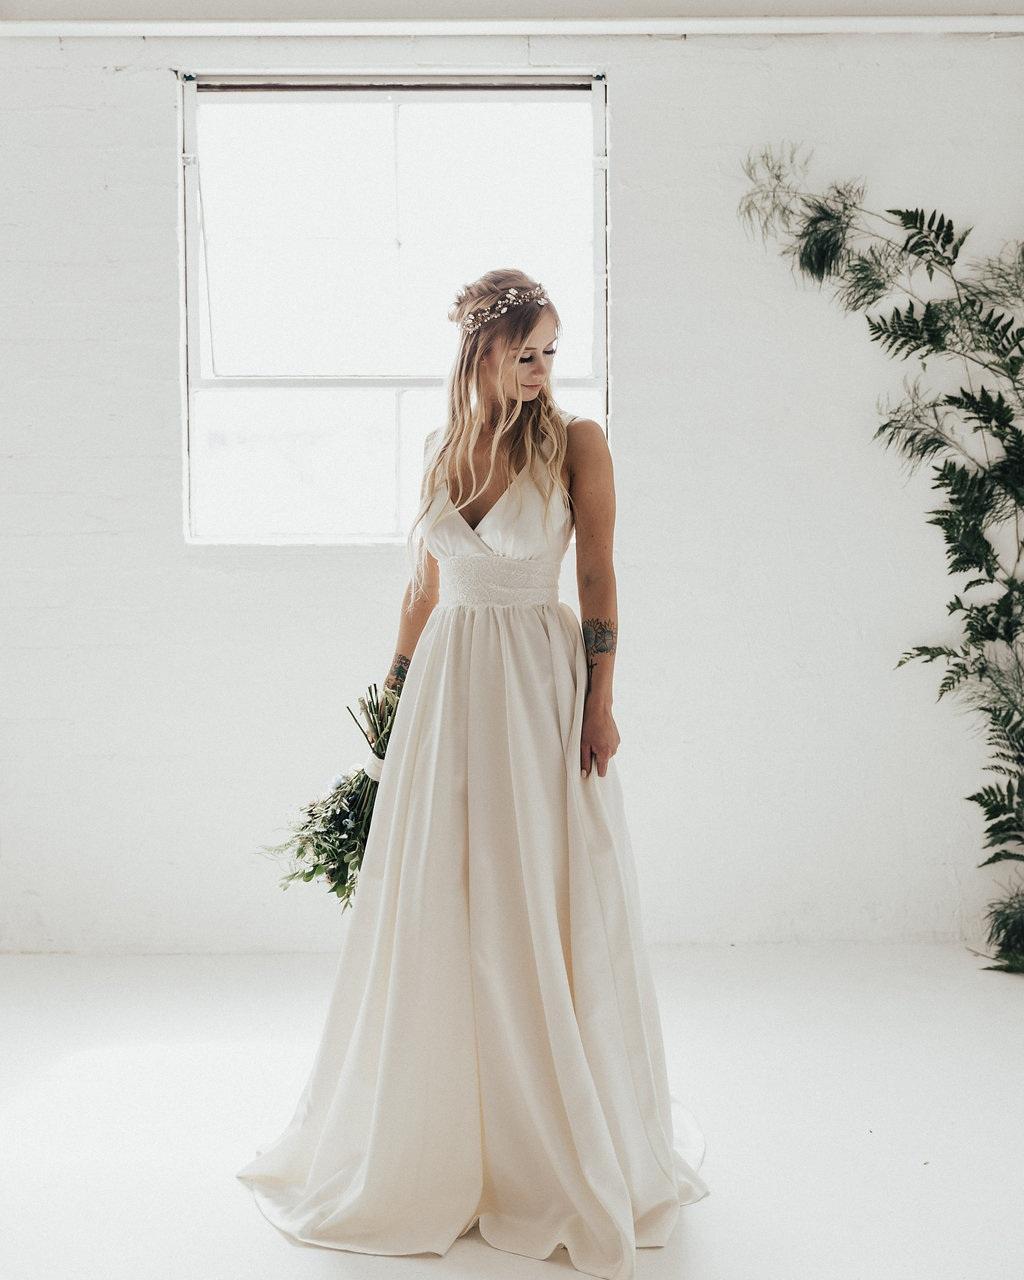 nicole+miller+modern+boho+bride